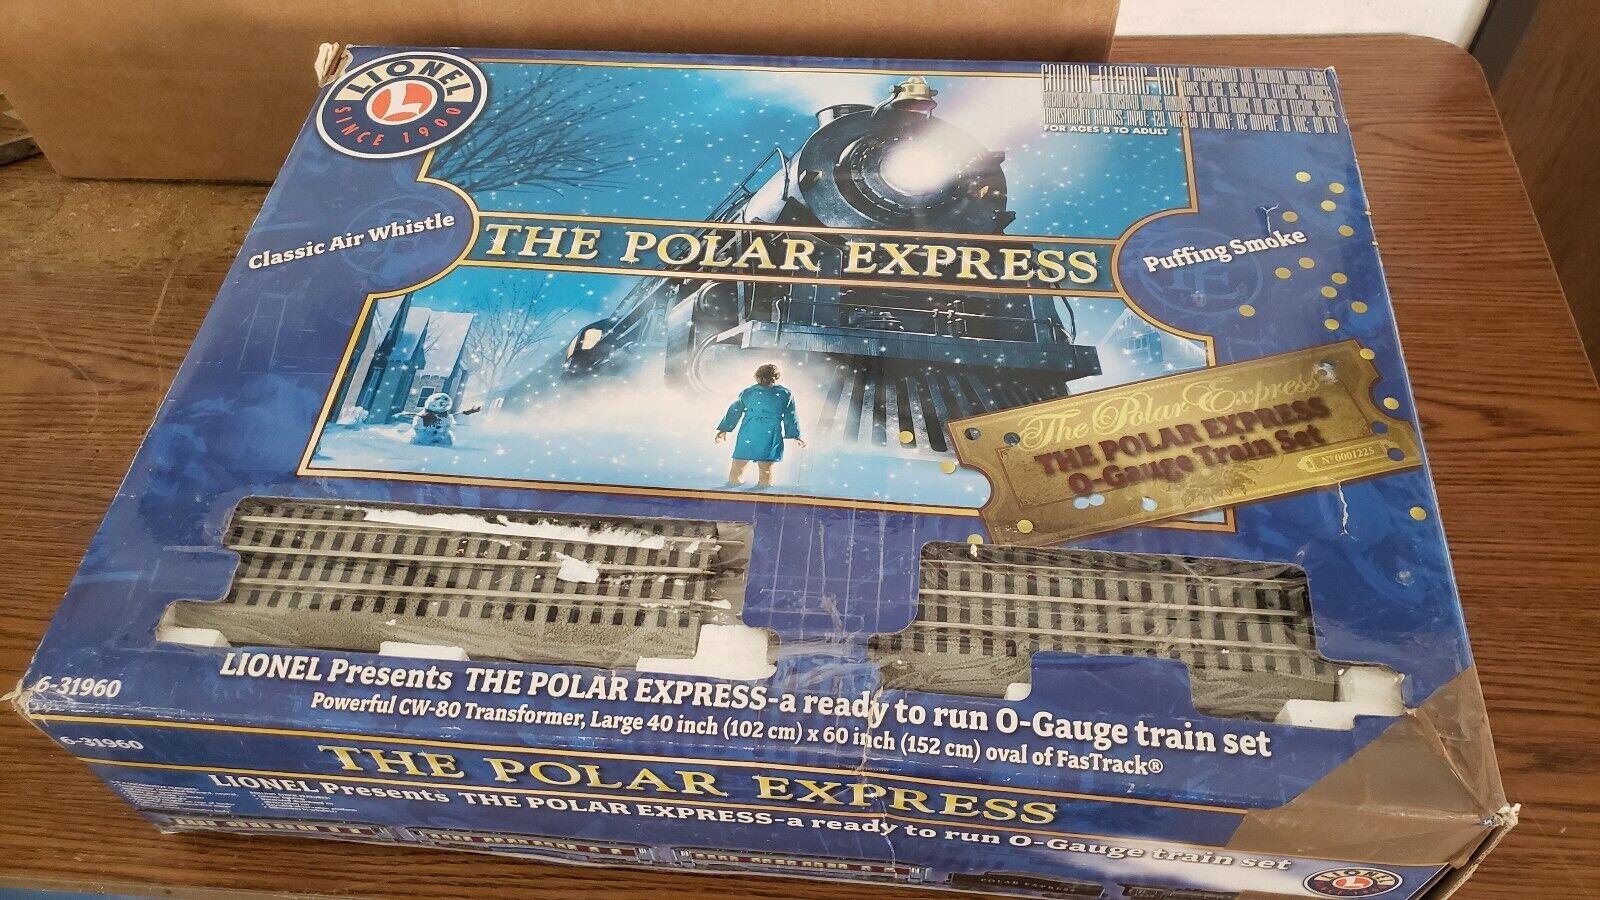 Lionel 631960 il Polar Express o Gauge TRENINO